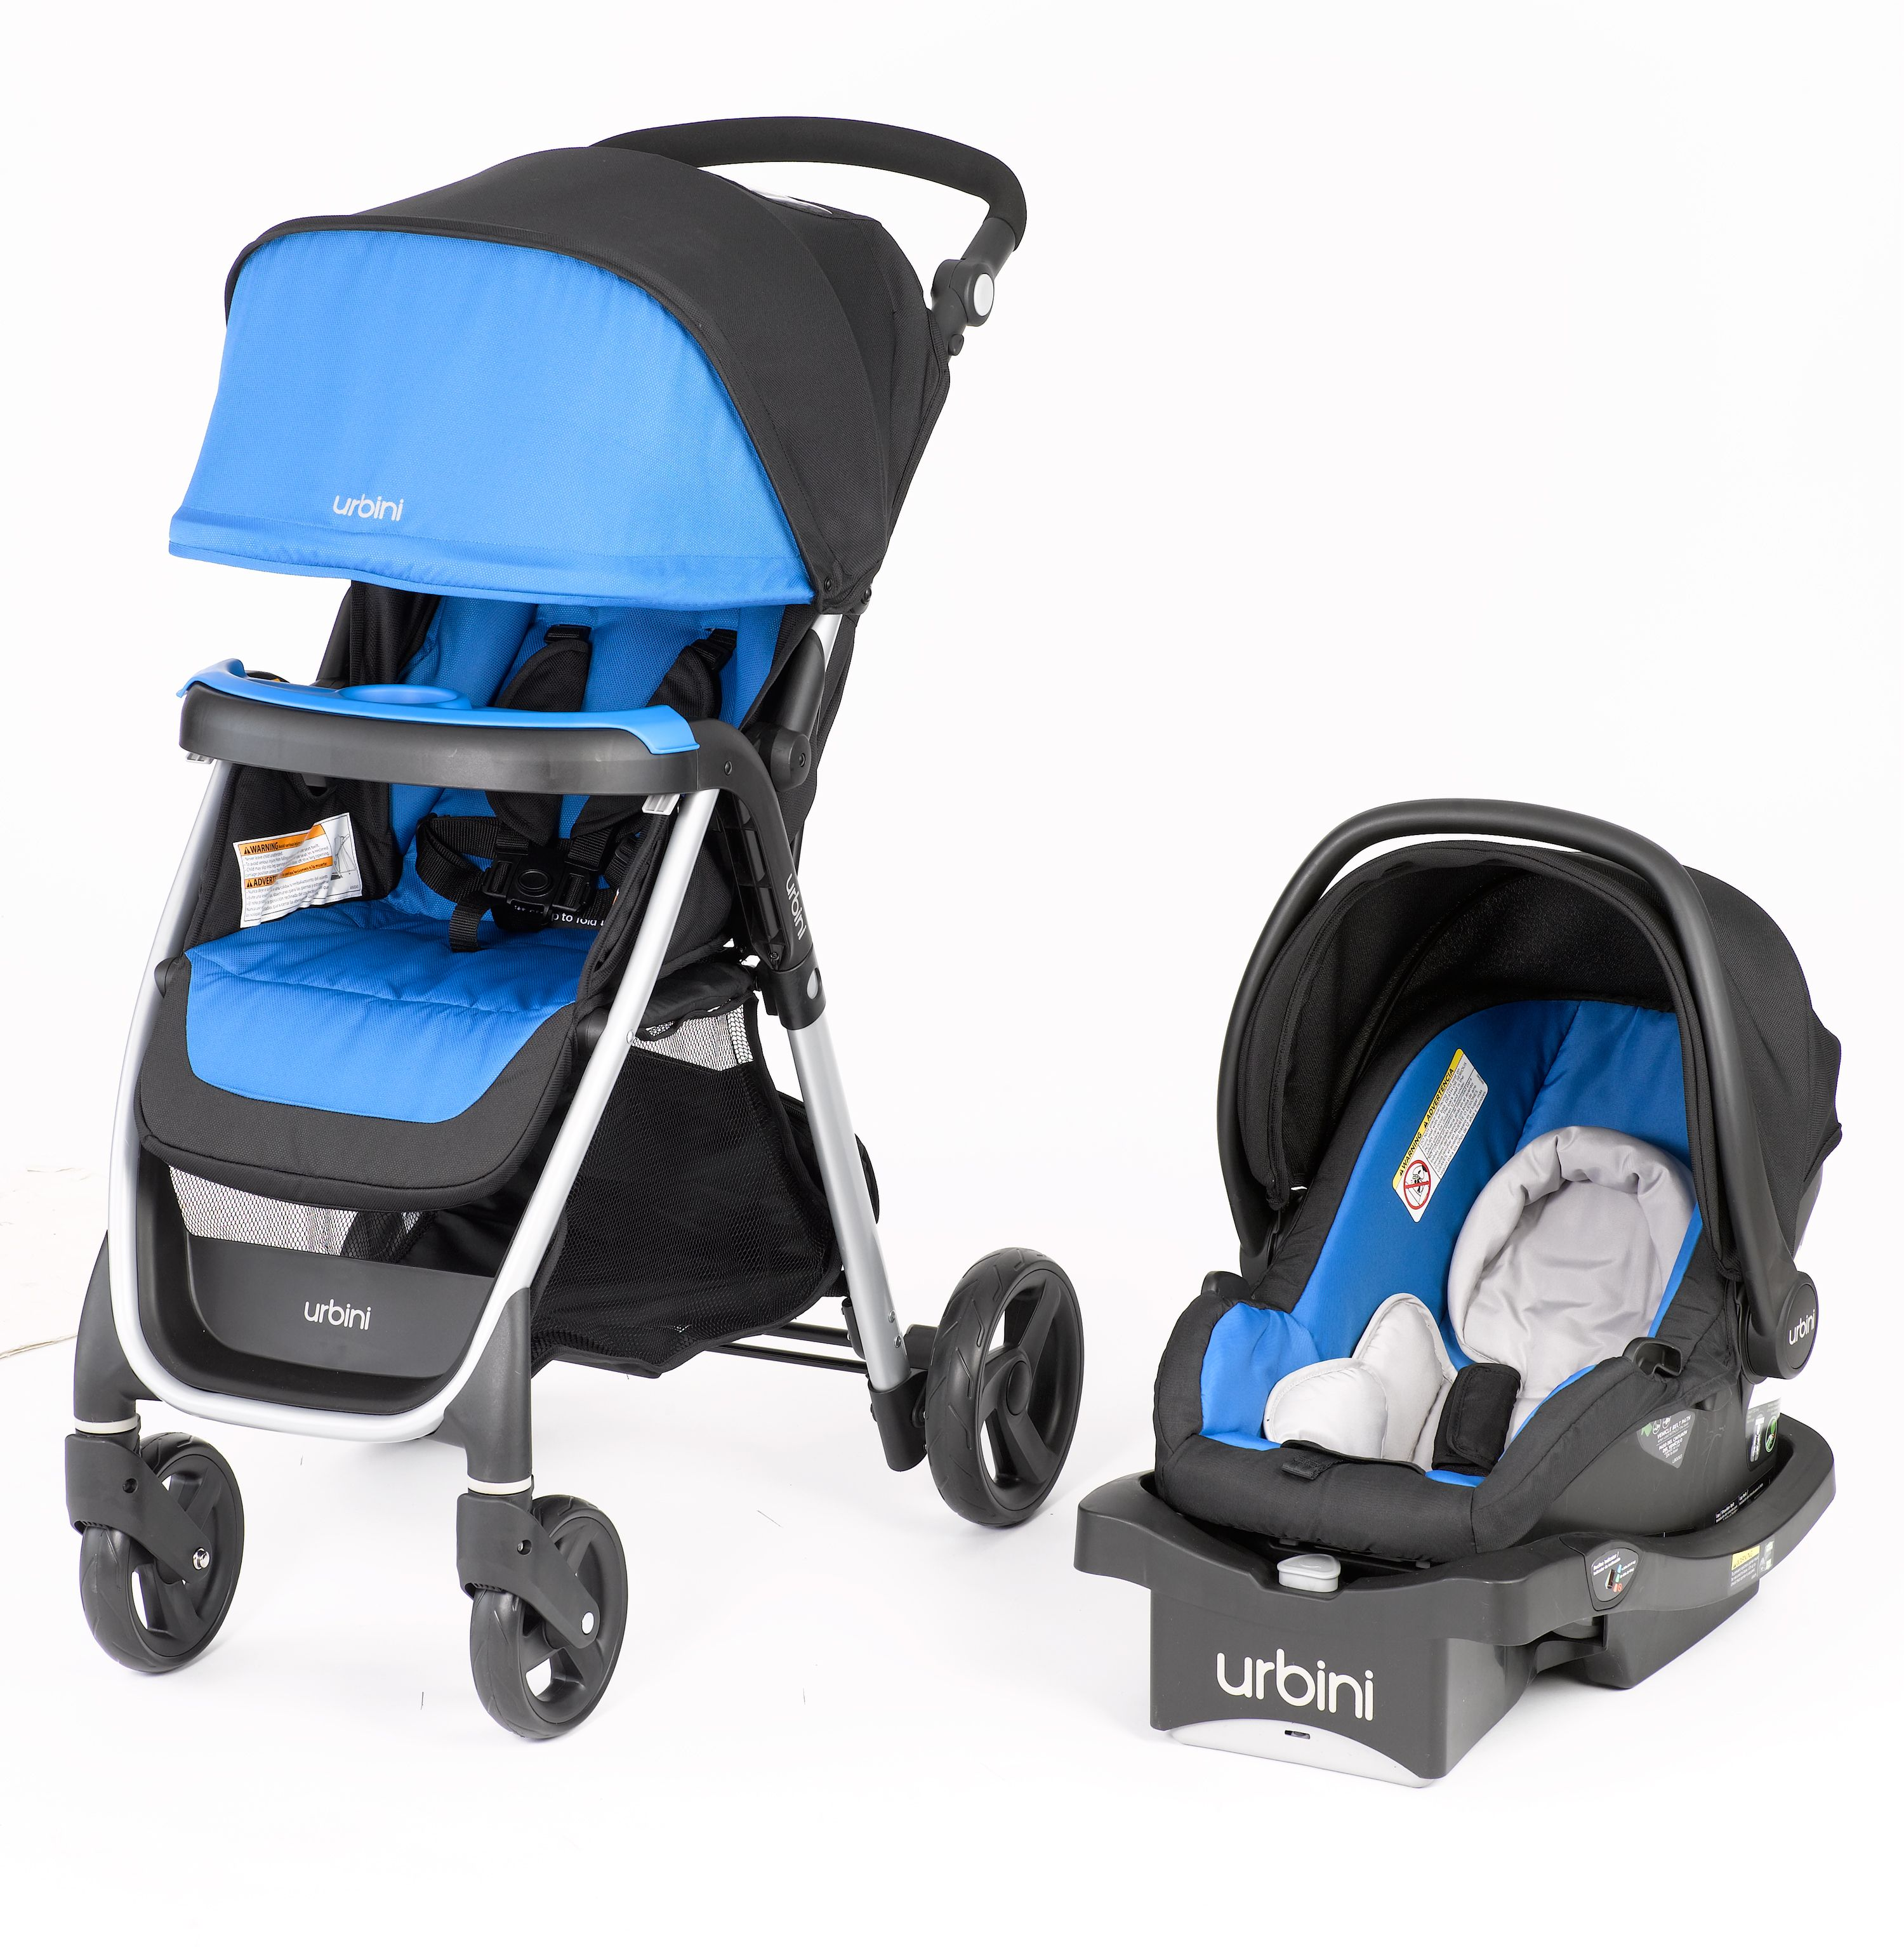 Urbini Turni Travel System baby Baby